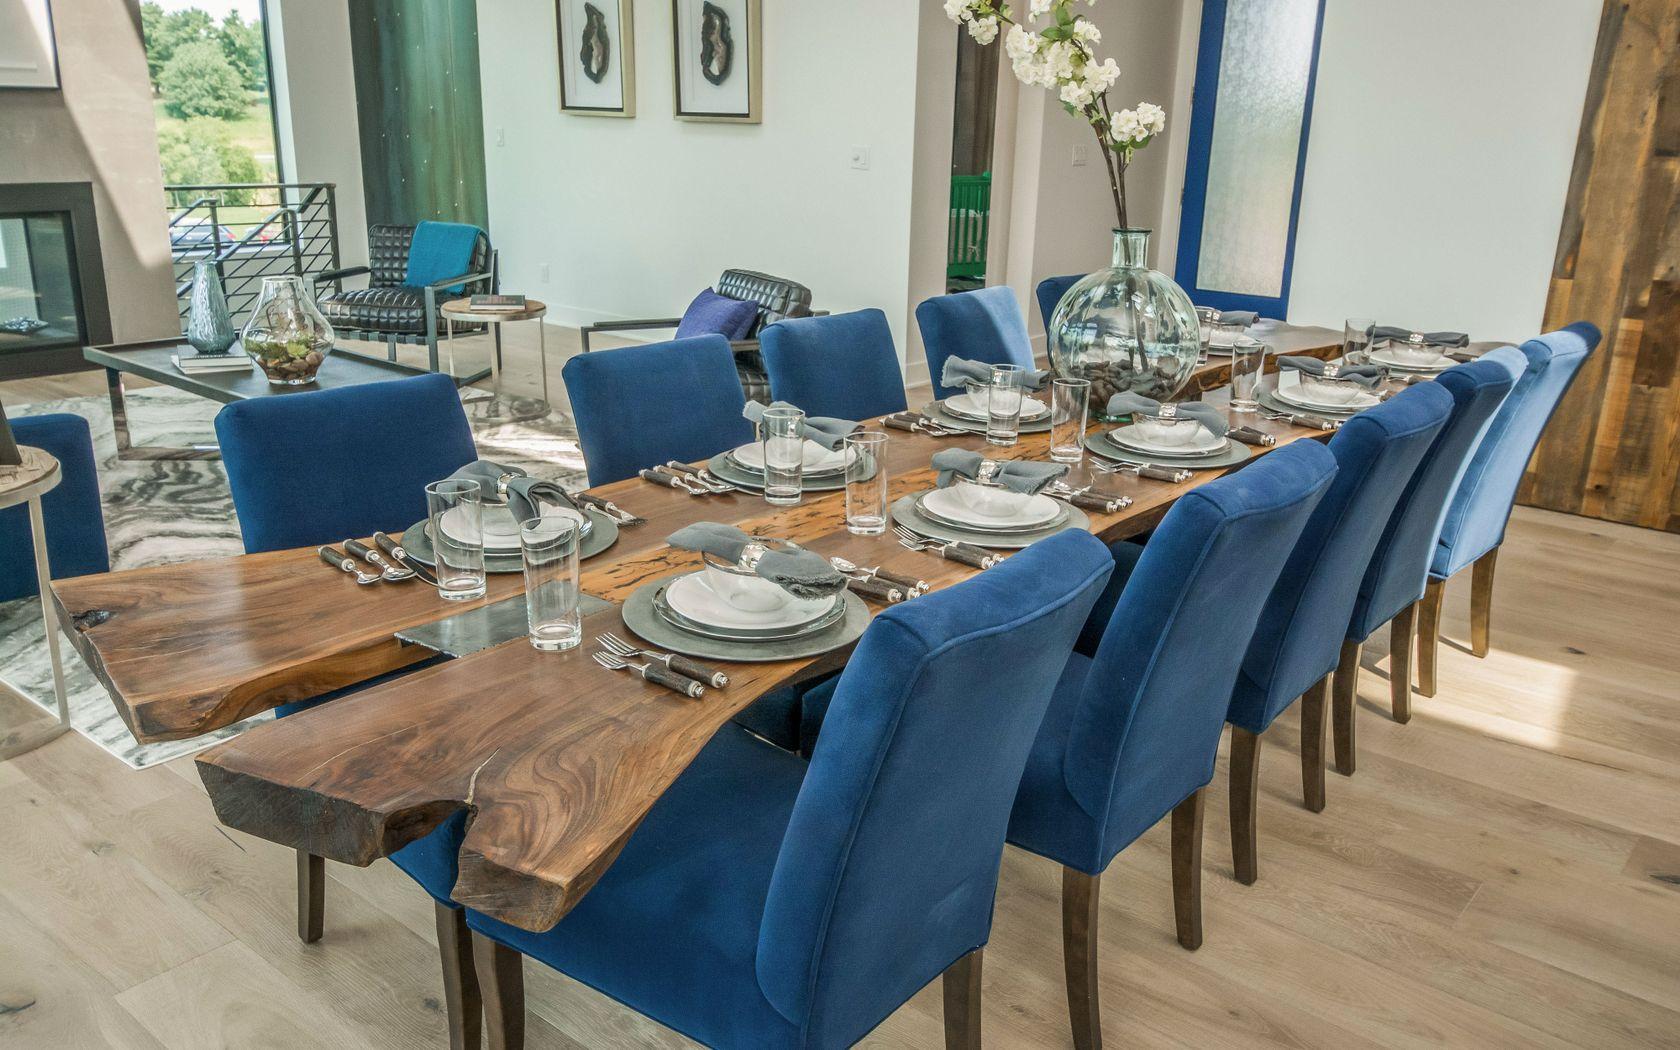 sofas by design des moines sofa cama chaise longue con arcon 2017 home show dining table elizabeth erin